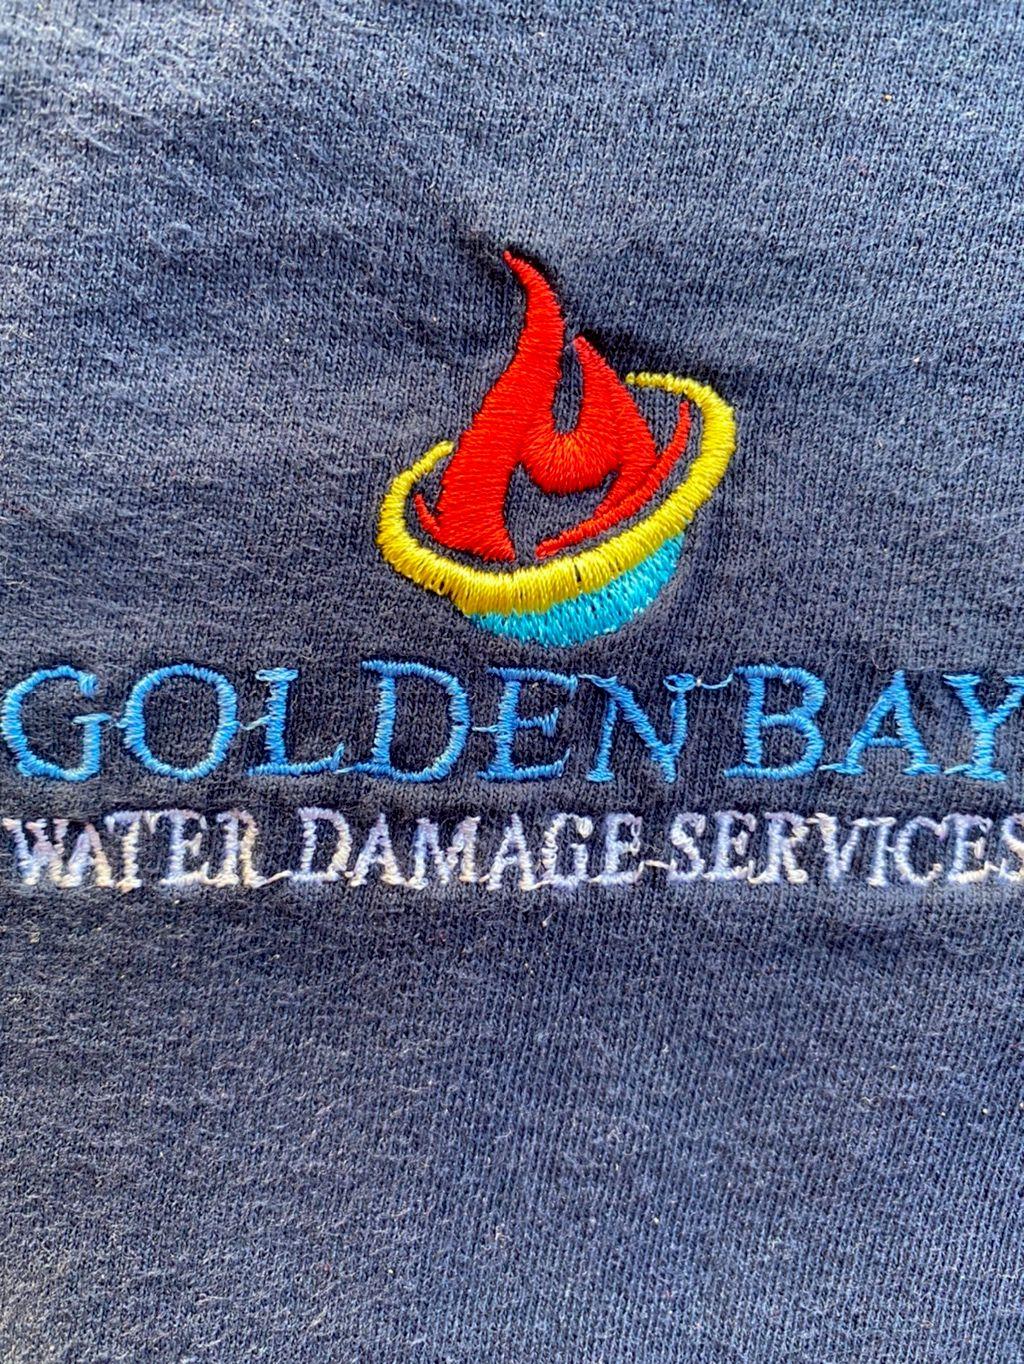 Golden Bay Restoration.